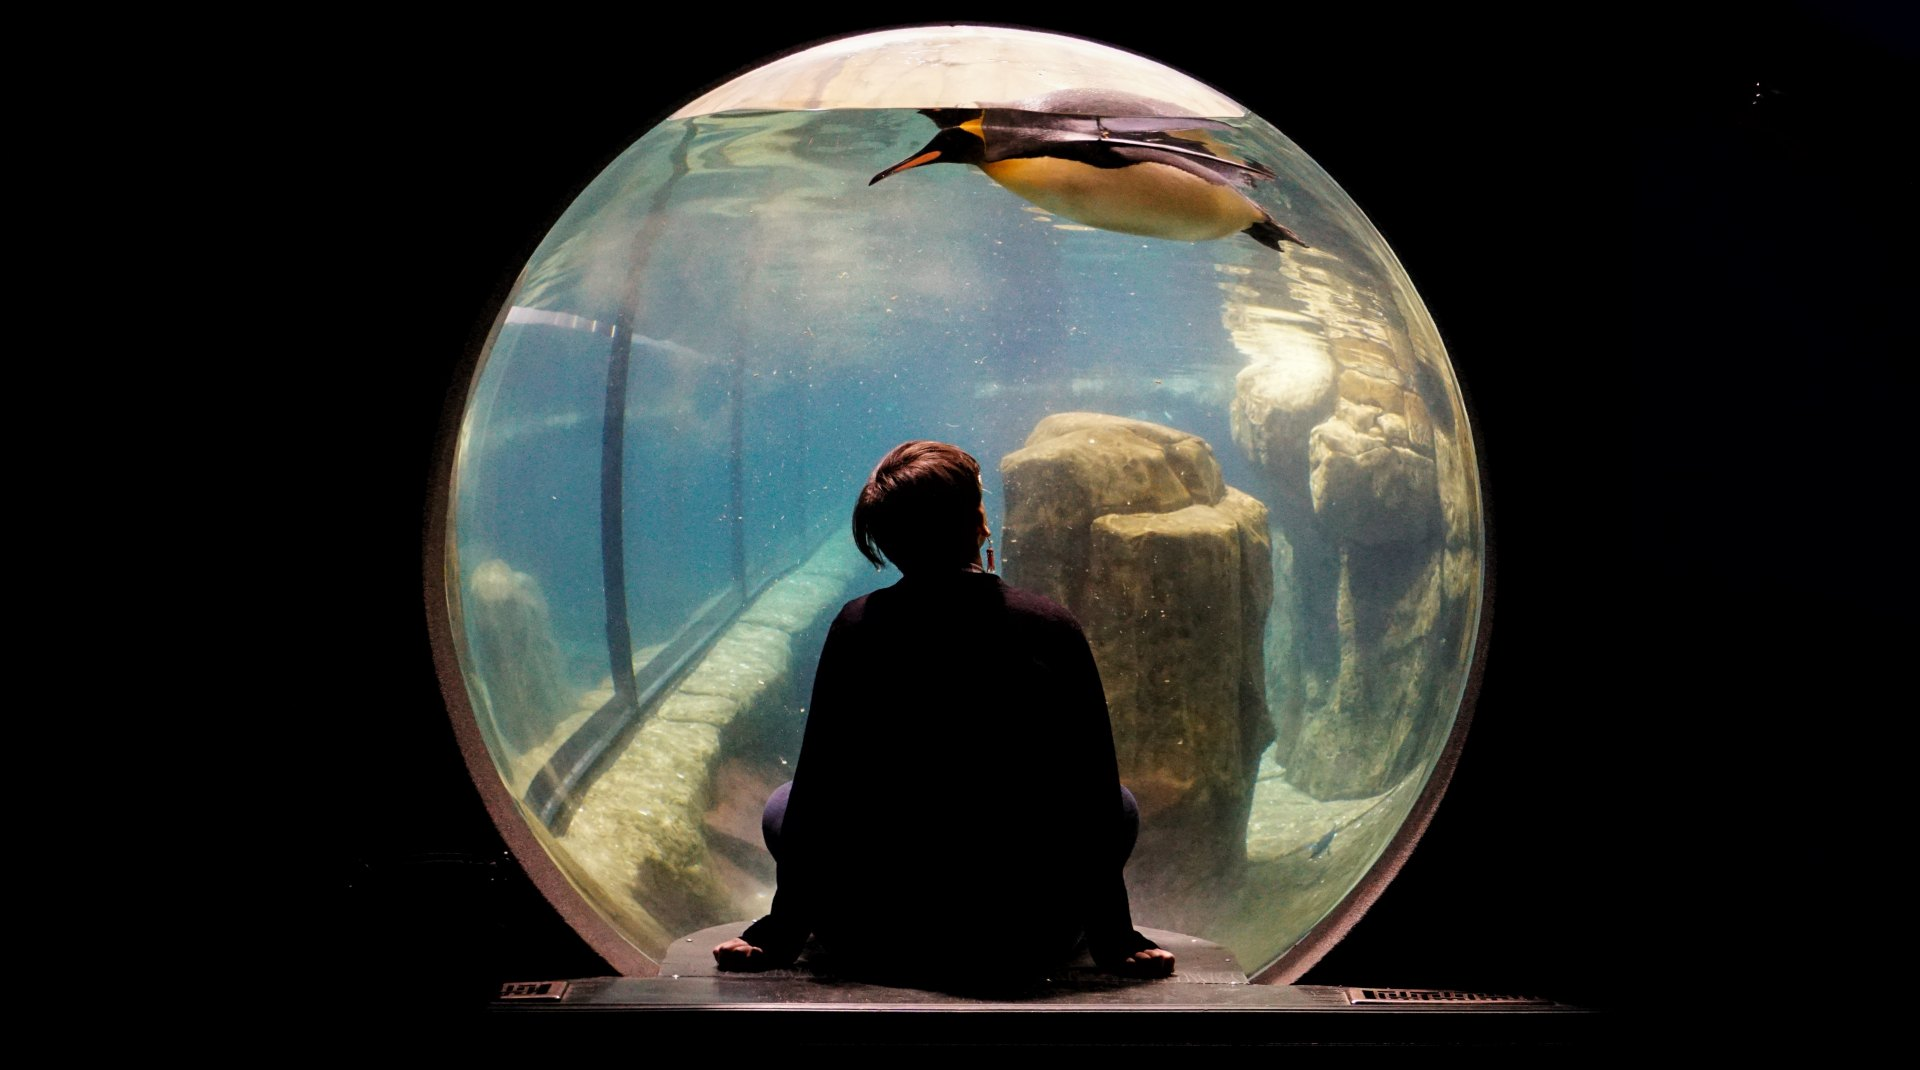 Aquarium Observation